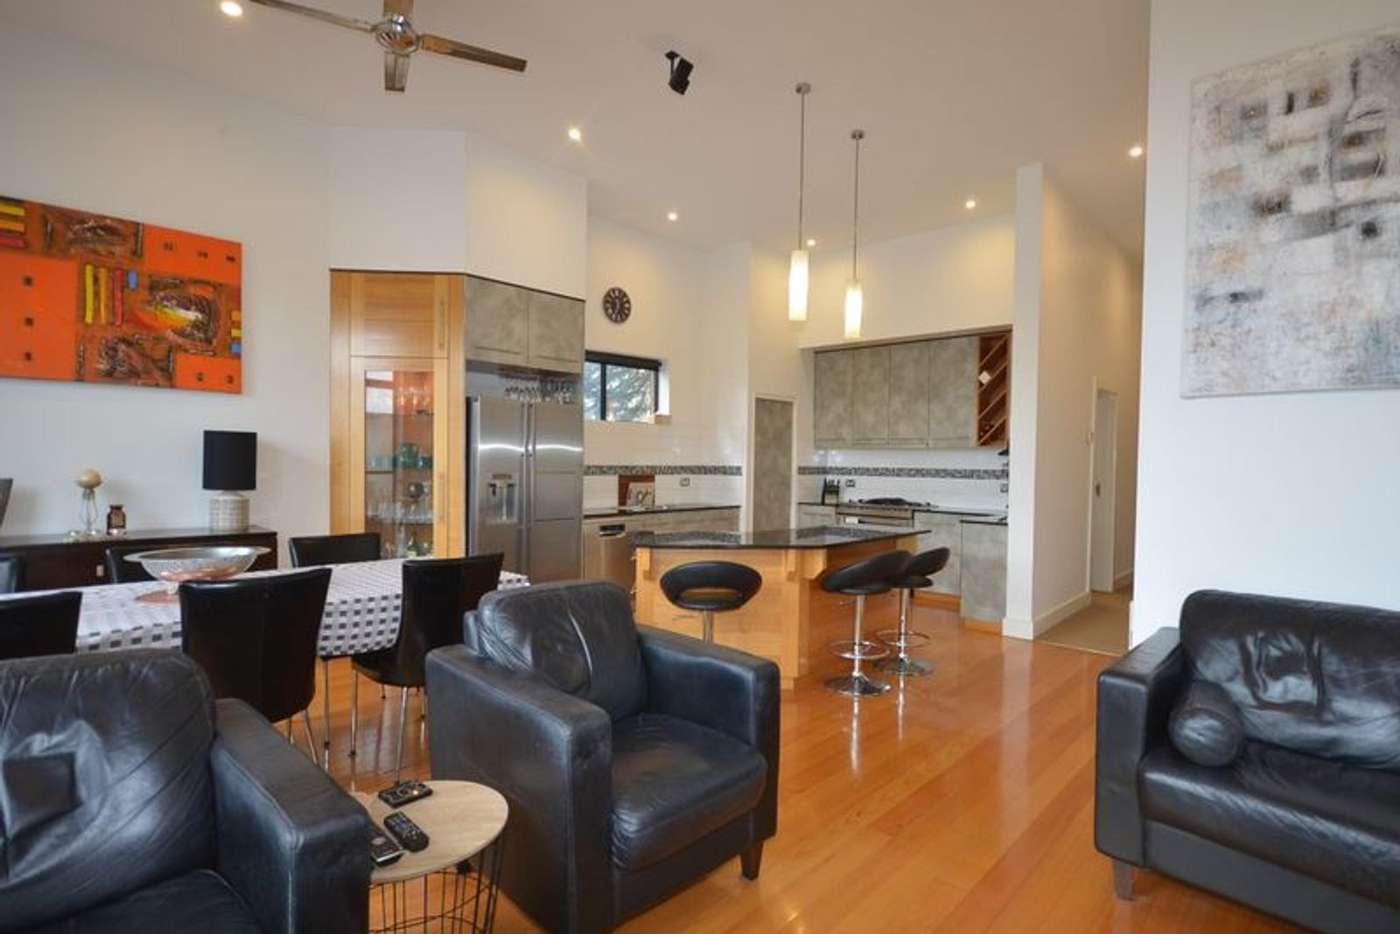 Main view of Homely house listing, 106 Mollison Street, Bendigo VIC 3550